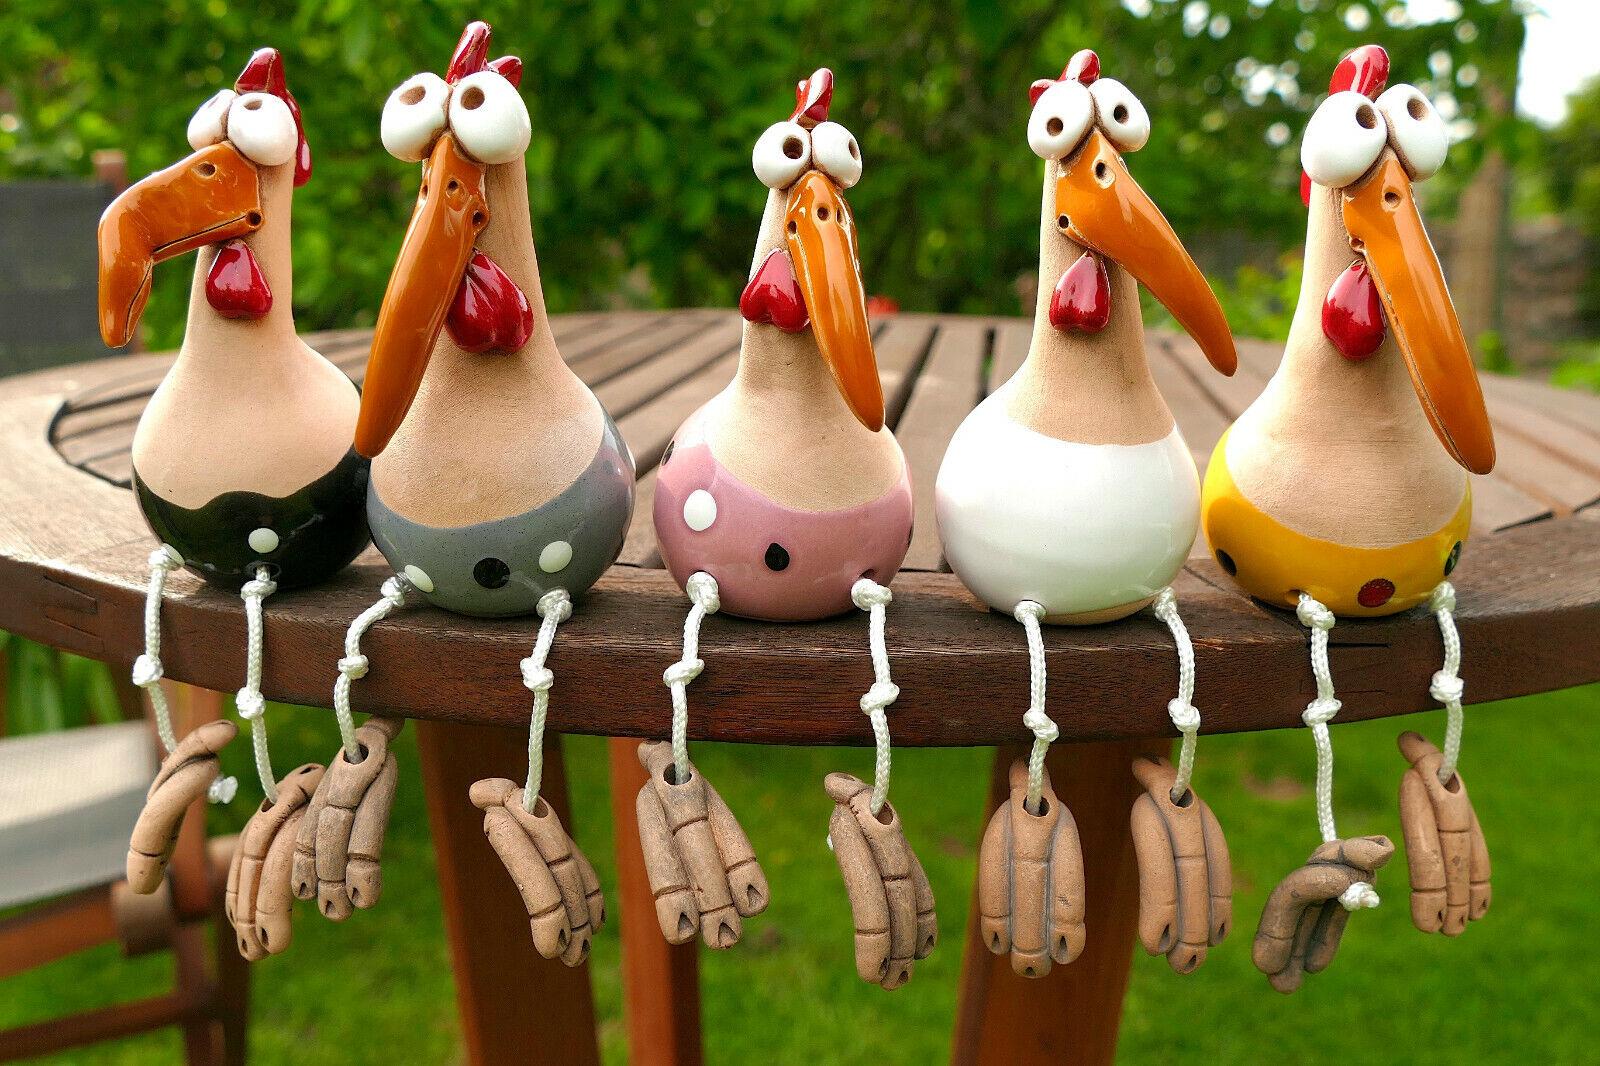 keramik,blumentopf,garten,terrasse,wetterfest,vogel,huhn,kantenhocker,hahn,deko